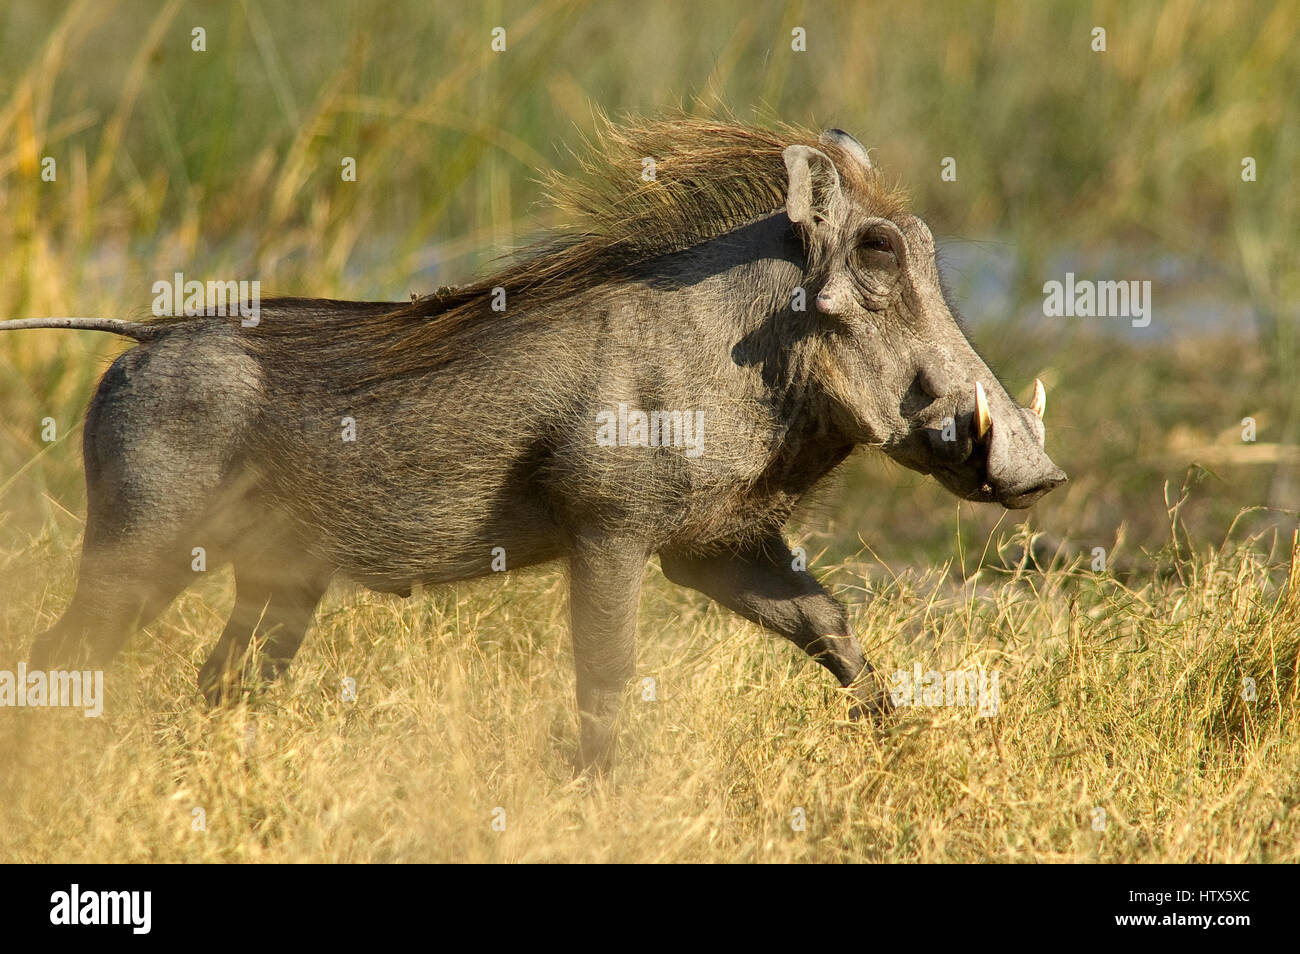 Warthog at Deception Valley, Central Kalahari National Park, Botswana - Stock Image